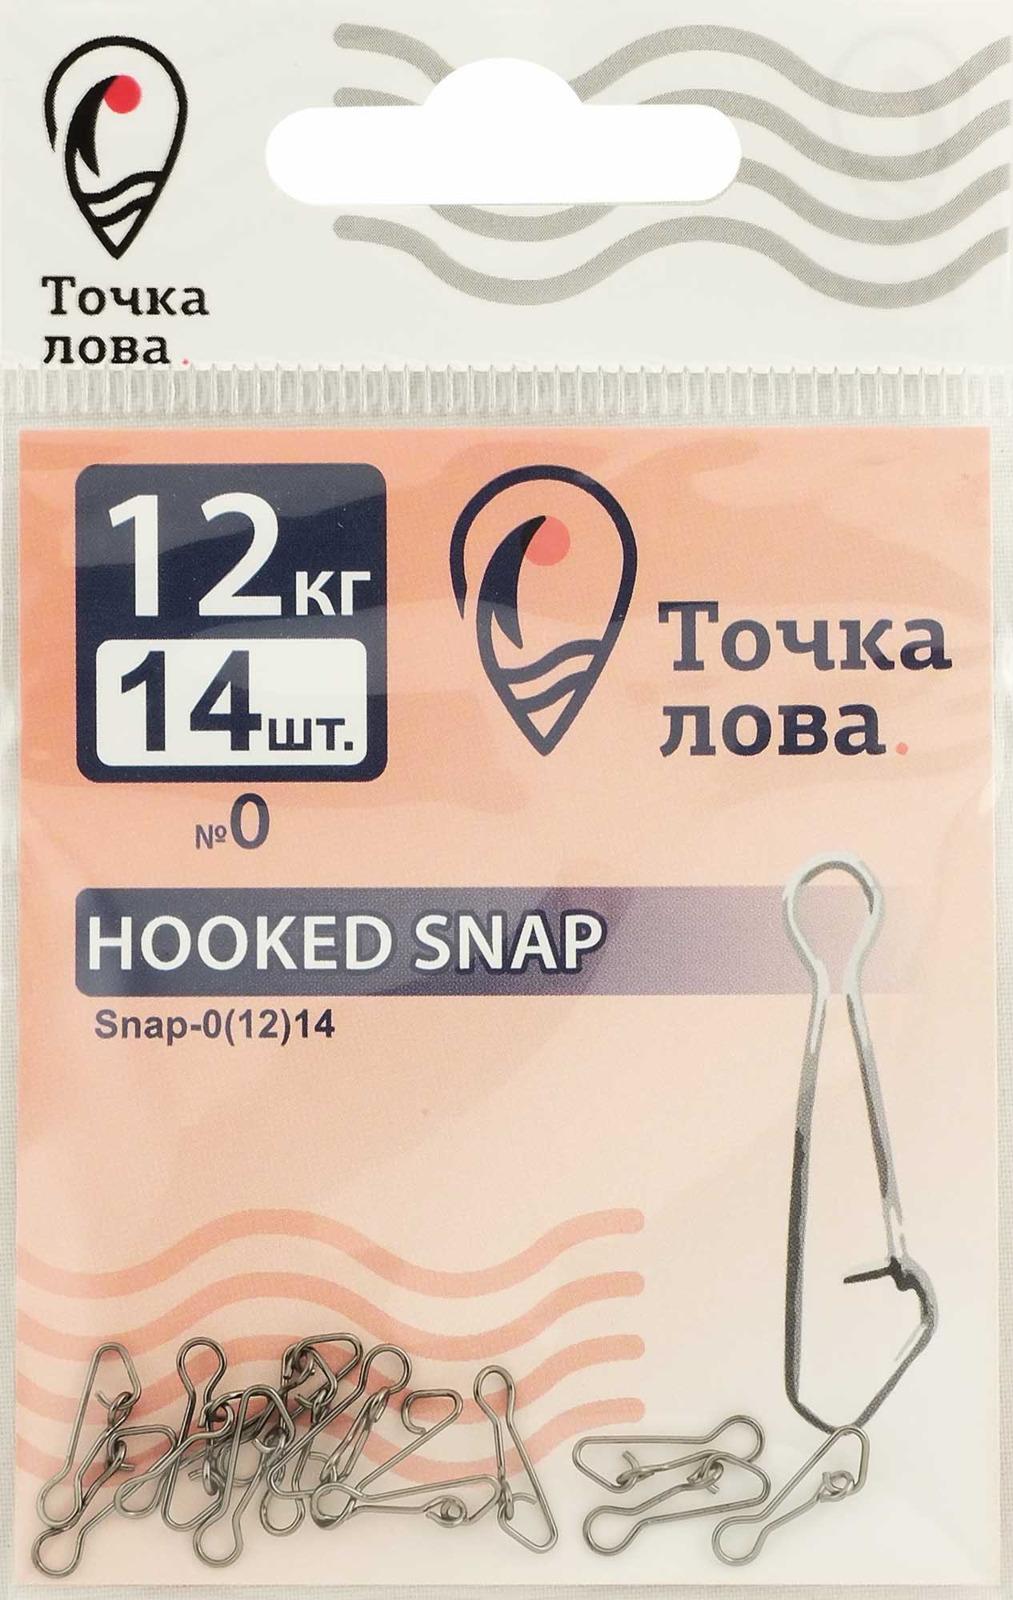 Аксессуар для рыбалки Точка Лова Застежка, Snap-0(12), 14 шт